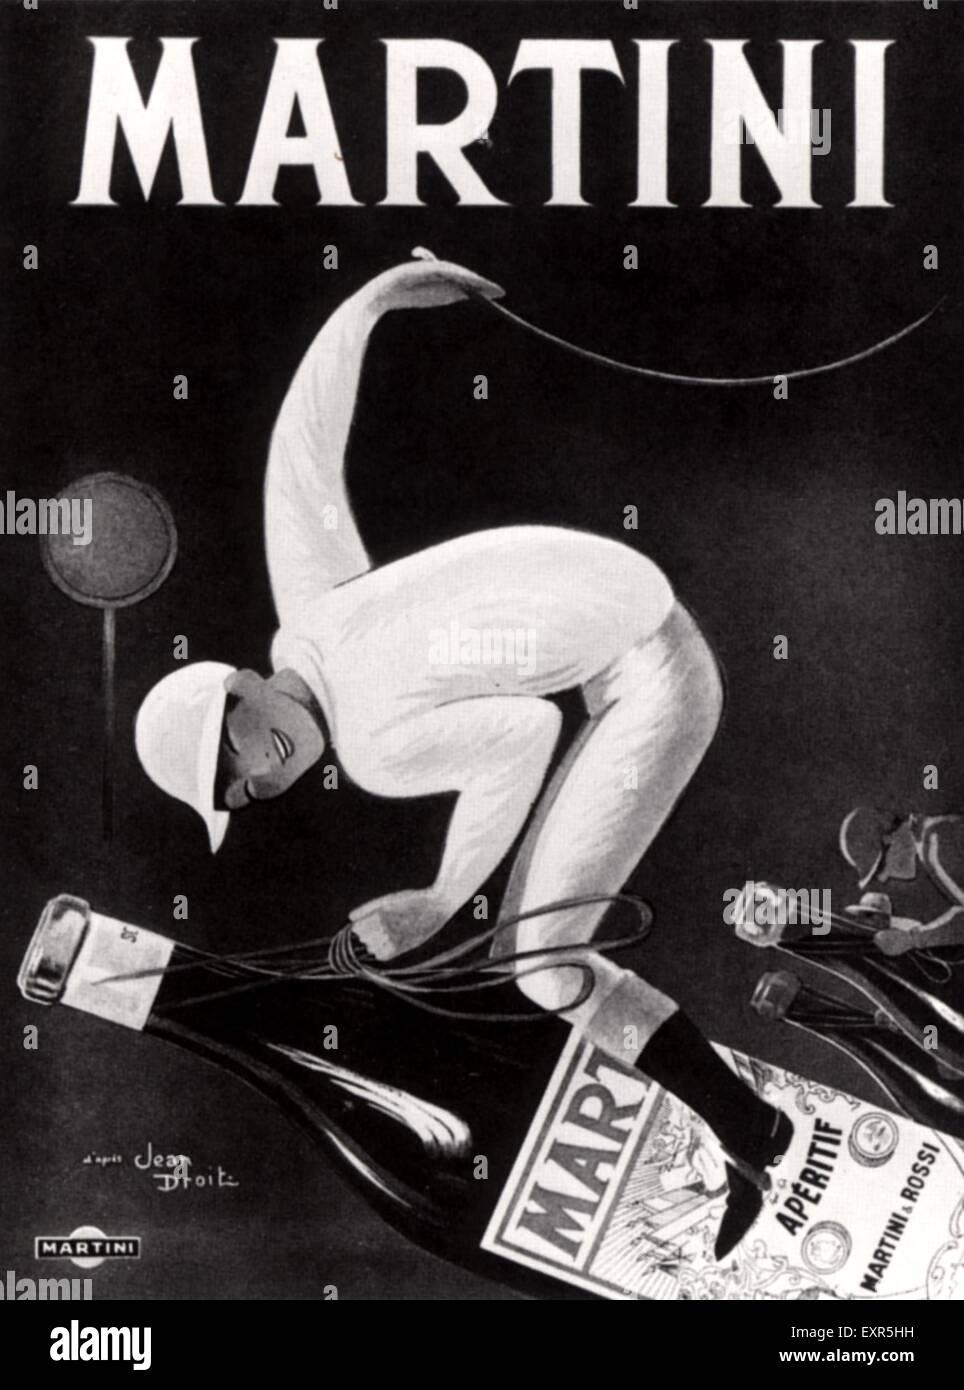 1910s France Martini Poster - Stock Image